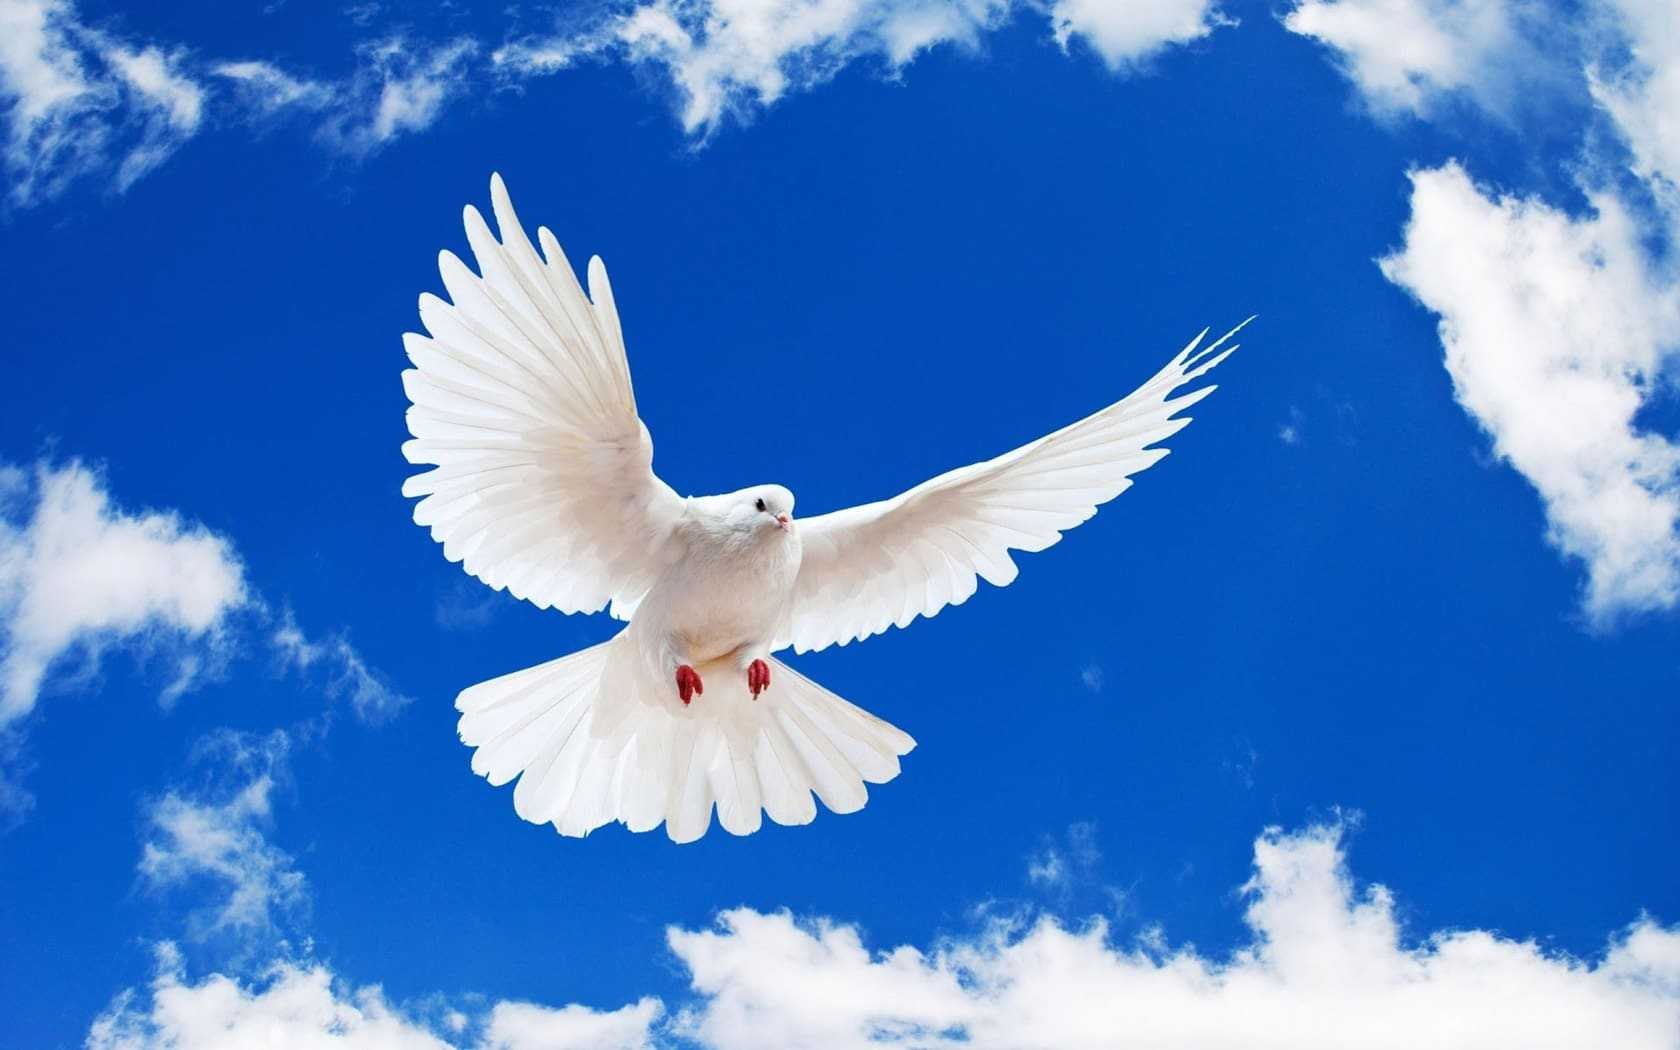 international day of peace logo